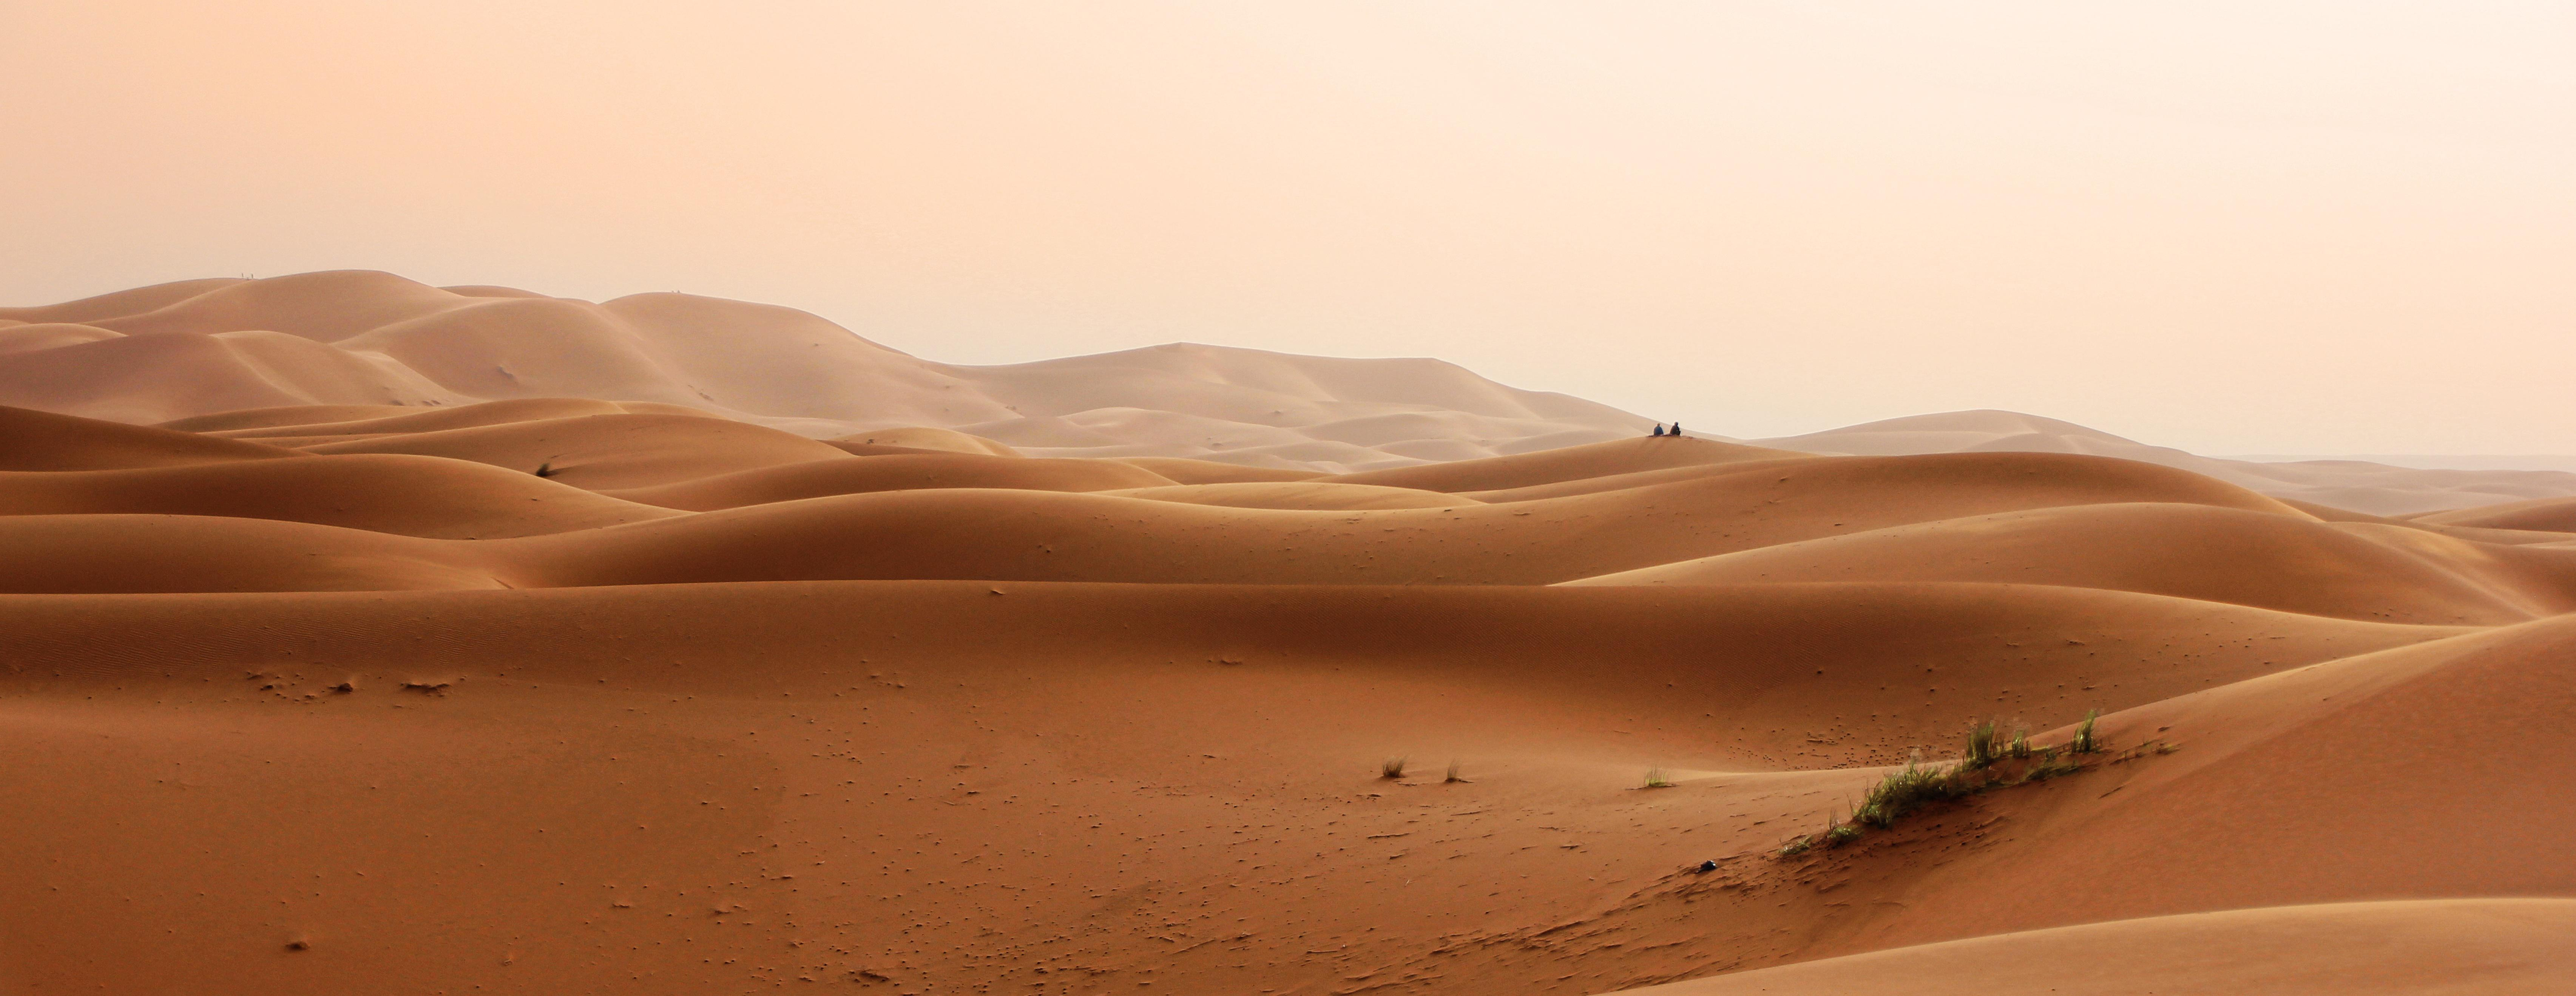 sand dunes of morocco 1574937479 - Sand Dunes Of Morocco -